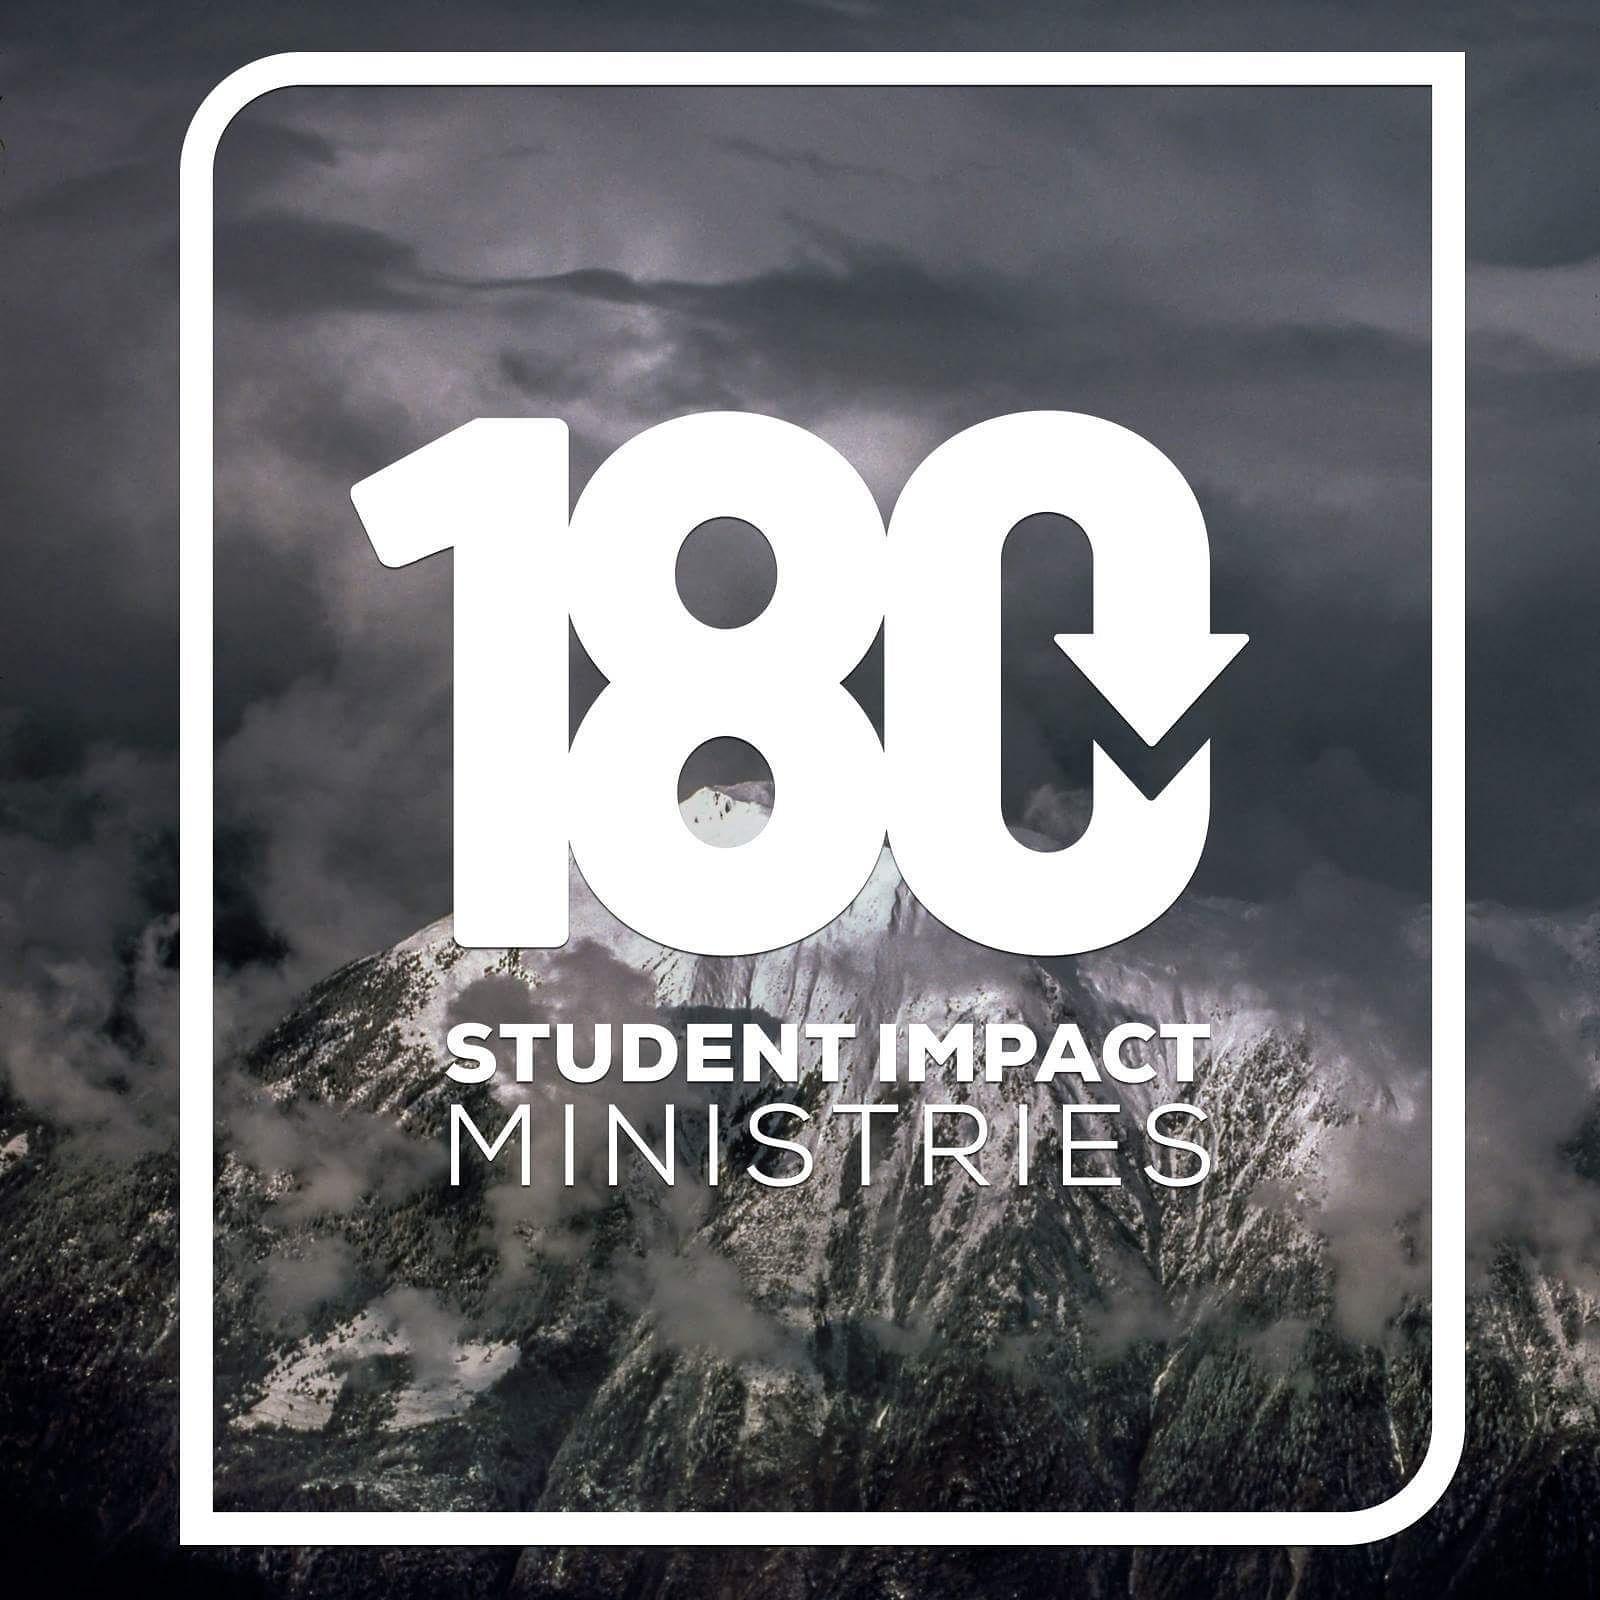 Dustin Bennet (Youth Pastor, Royal Oak Victory Church)